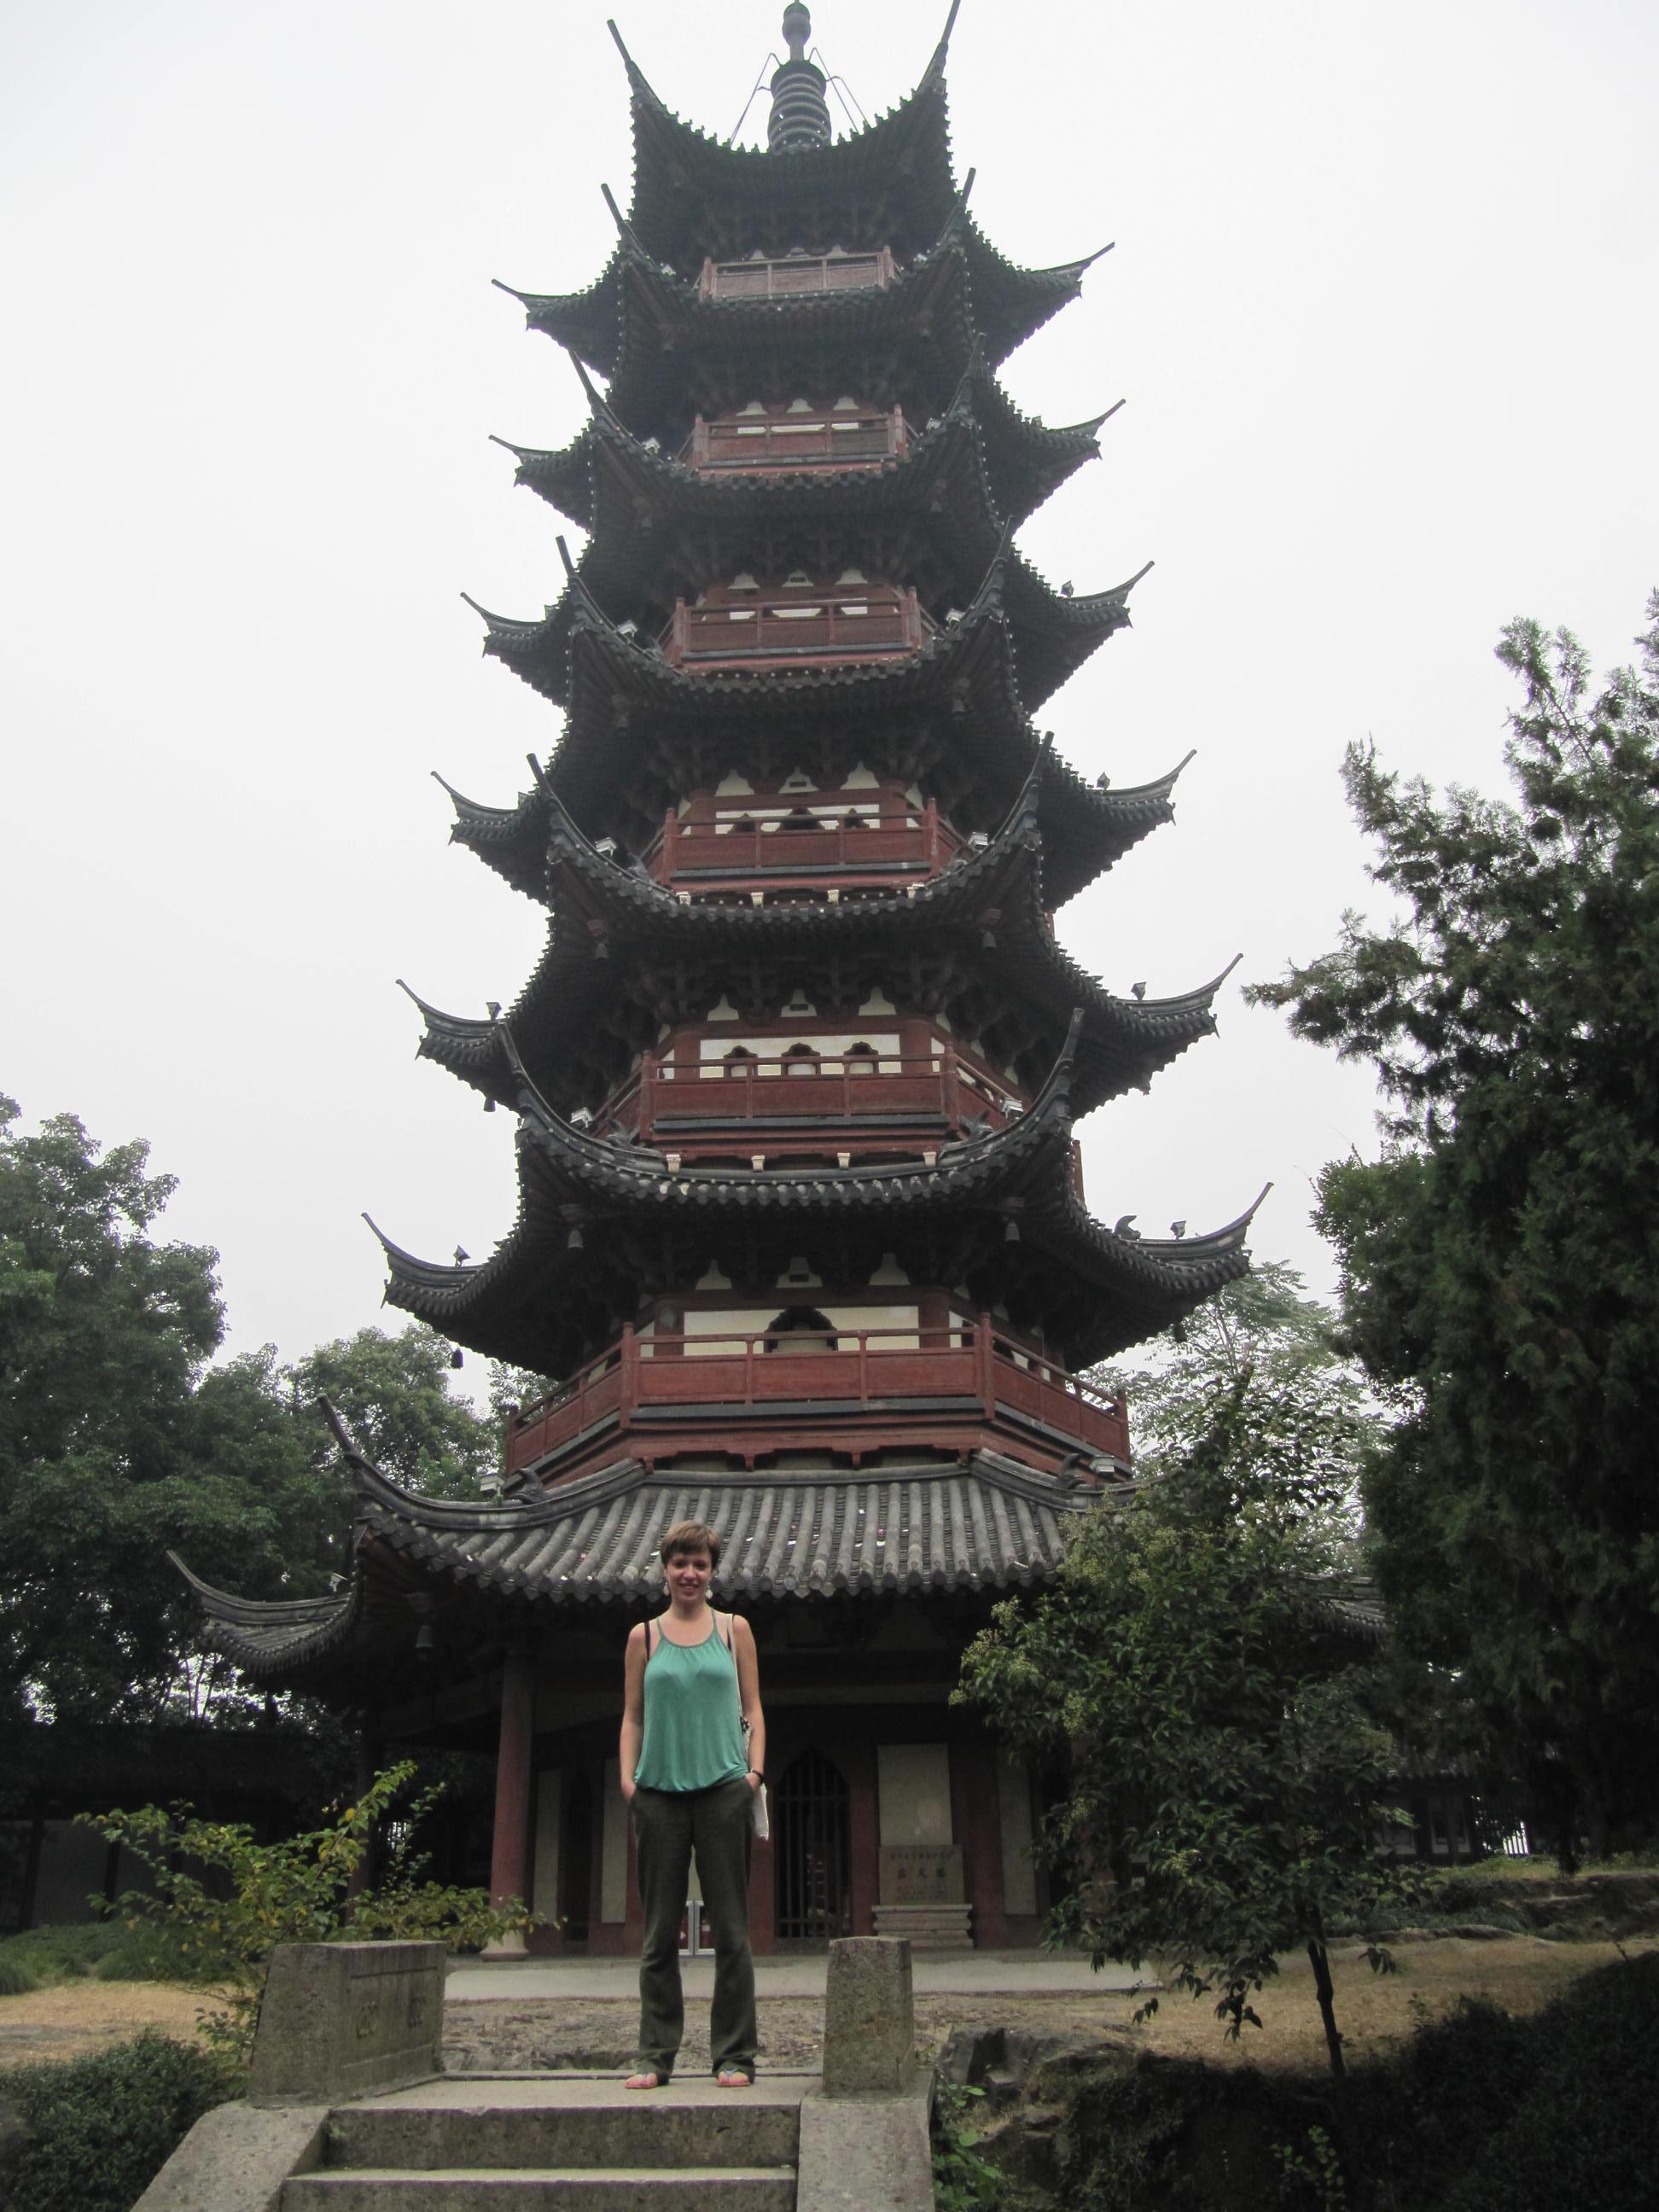 Padoga na wzgórzu w Shaoxing